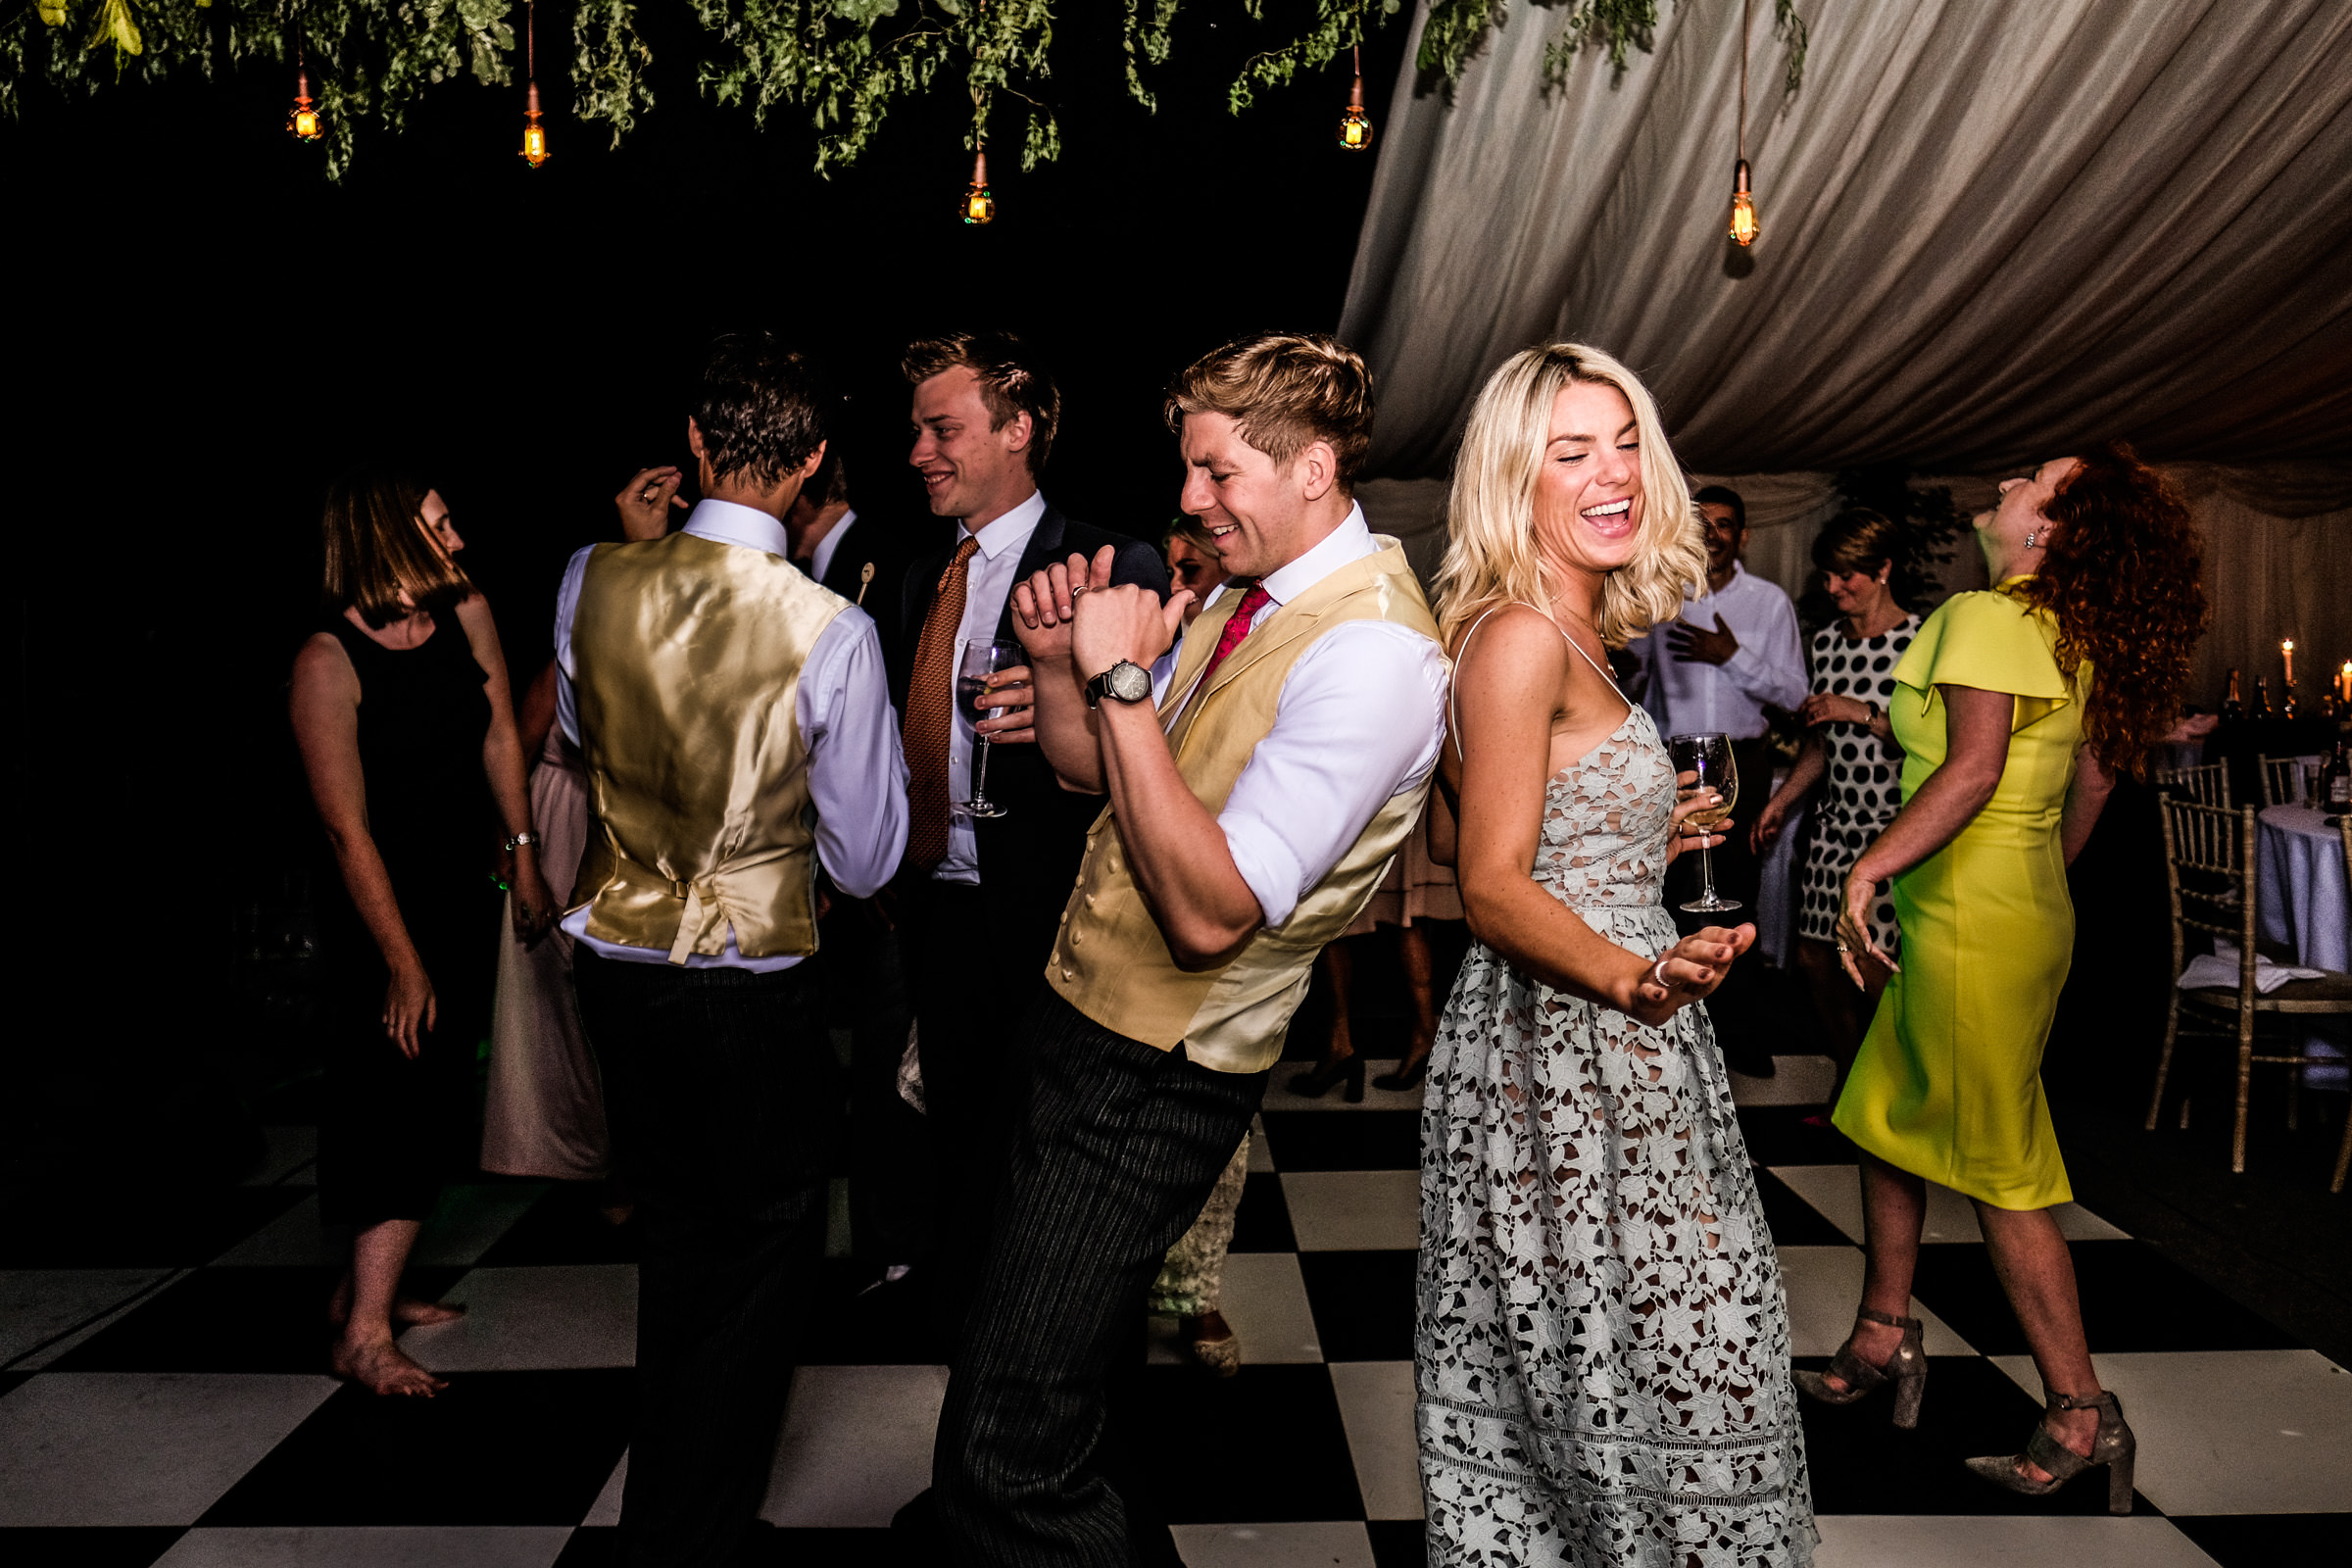 Natural+wedding+photography+portfolio+130.jpg